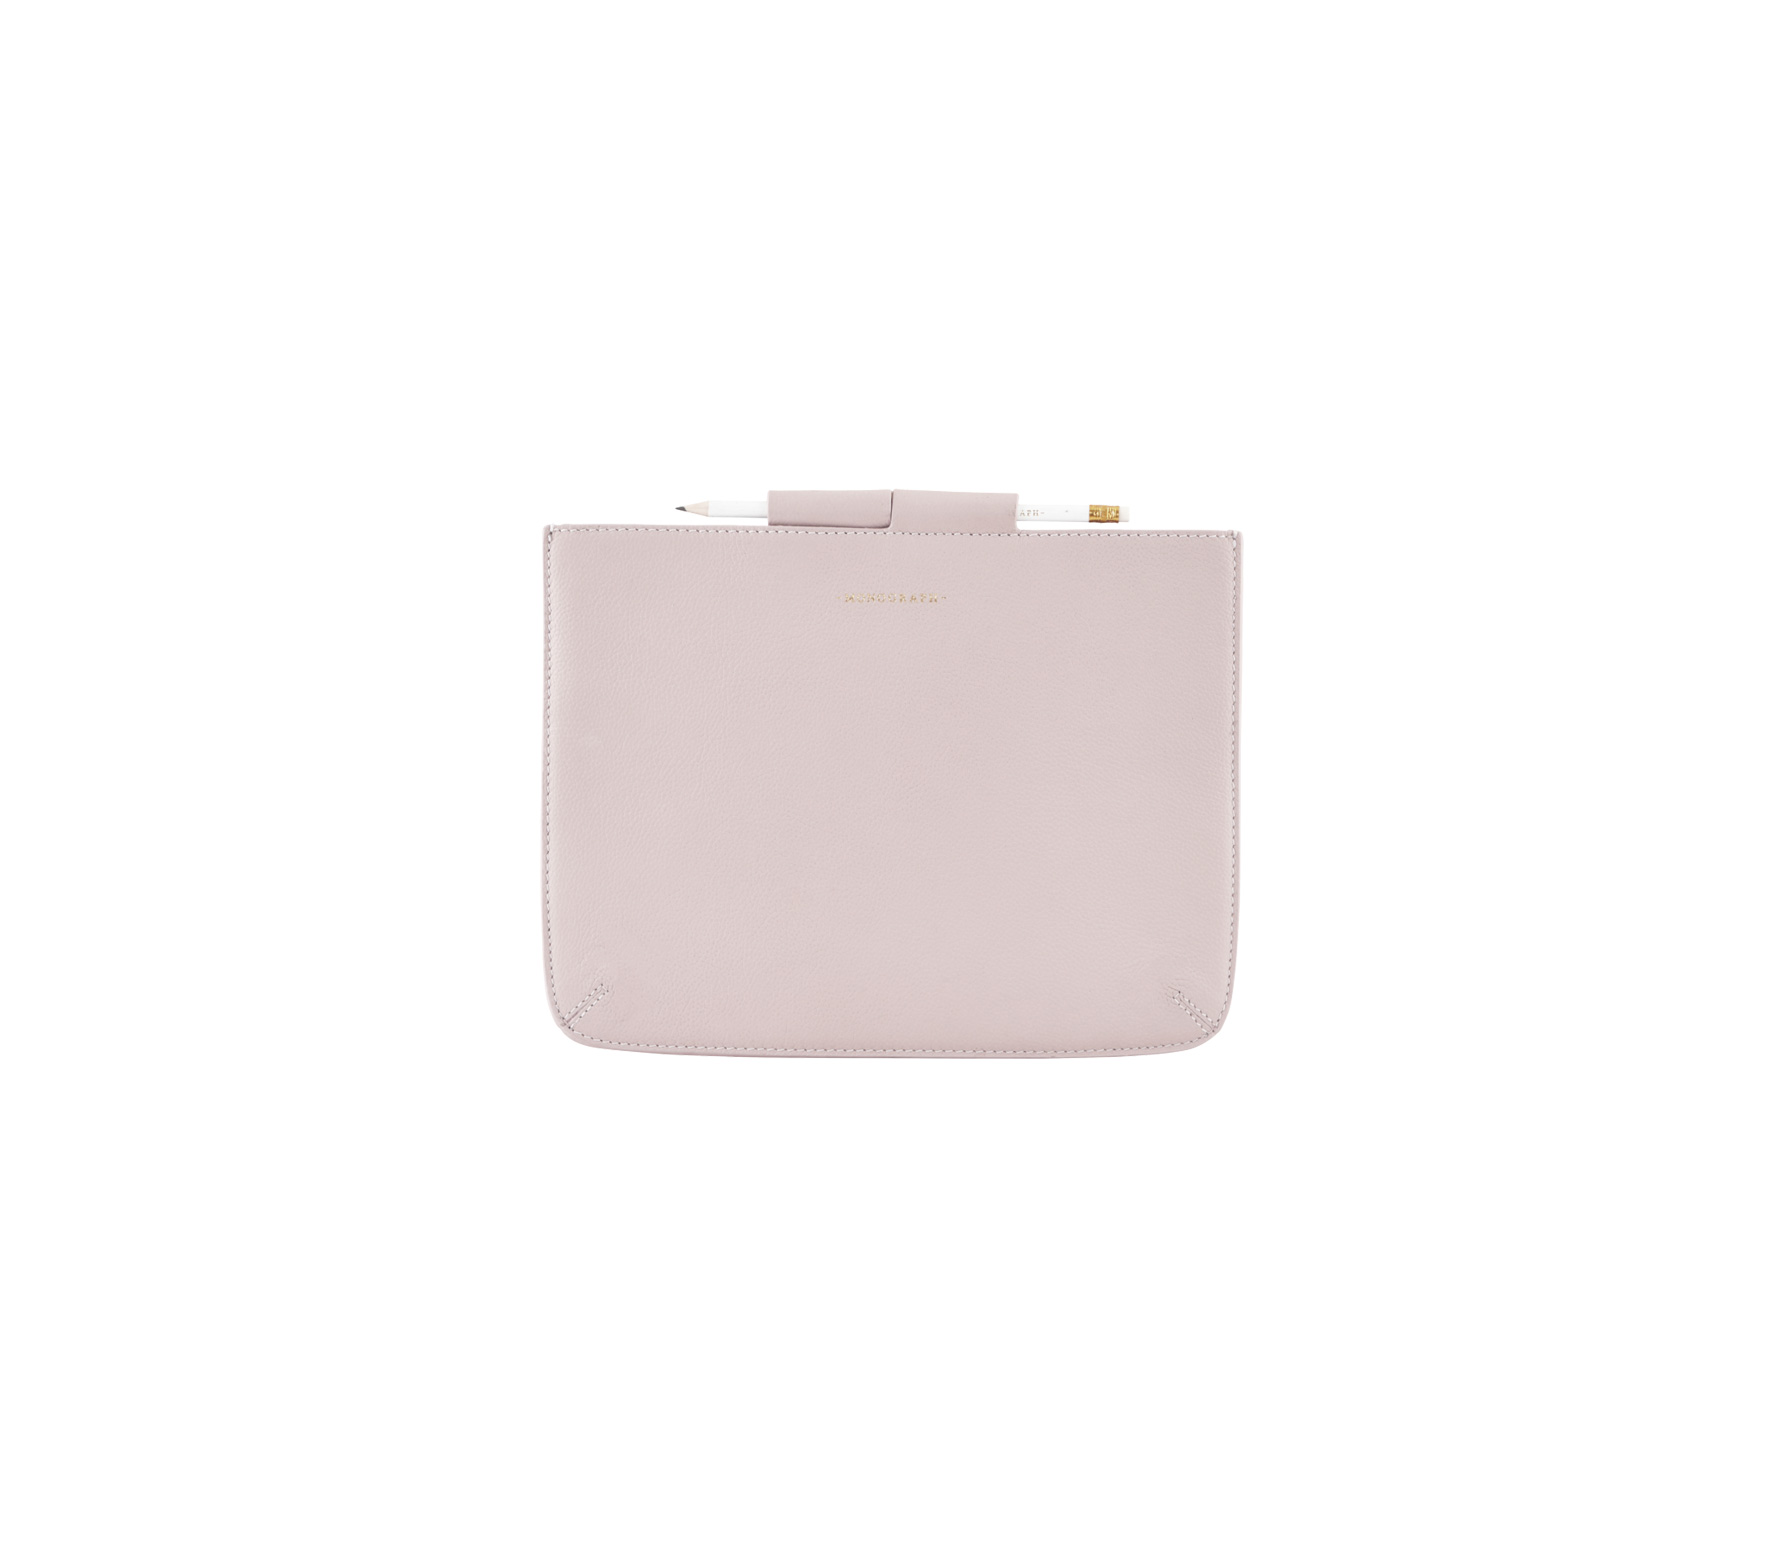 Housedoctor Cover iPad hoes leer roze Mini 24 x 17 cm